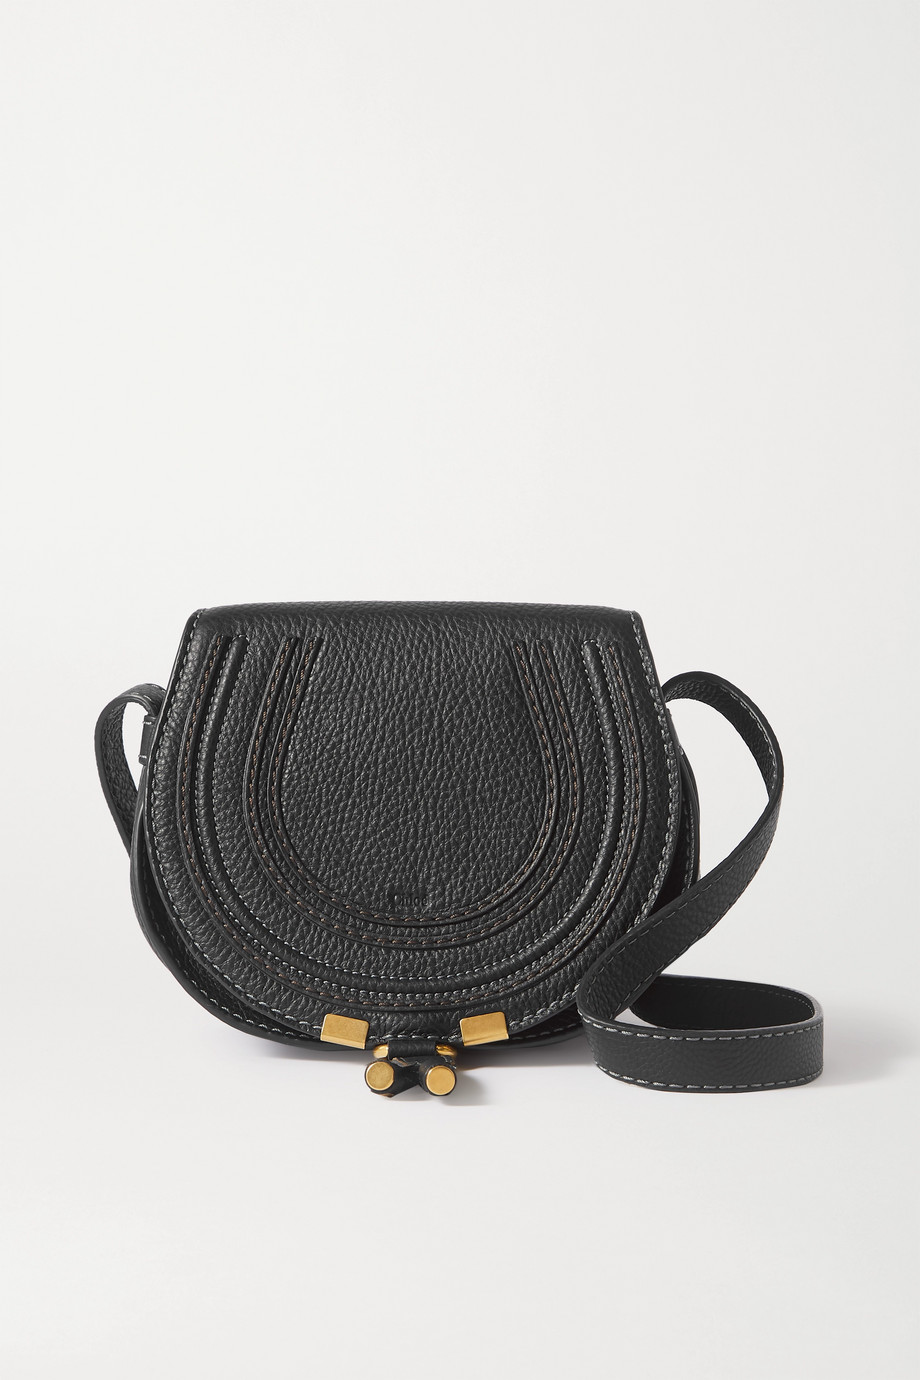 Chloé Sac porté épaule en cuir texturé Marcie Mini